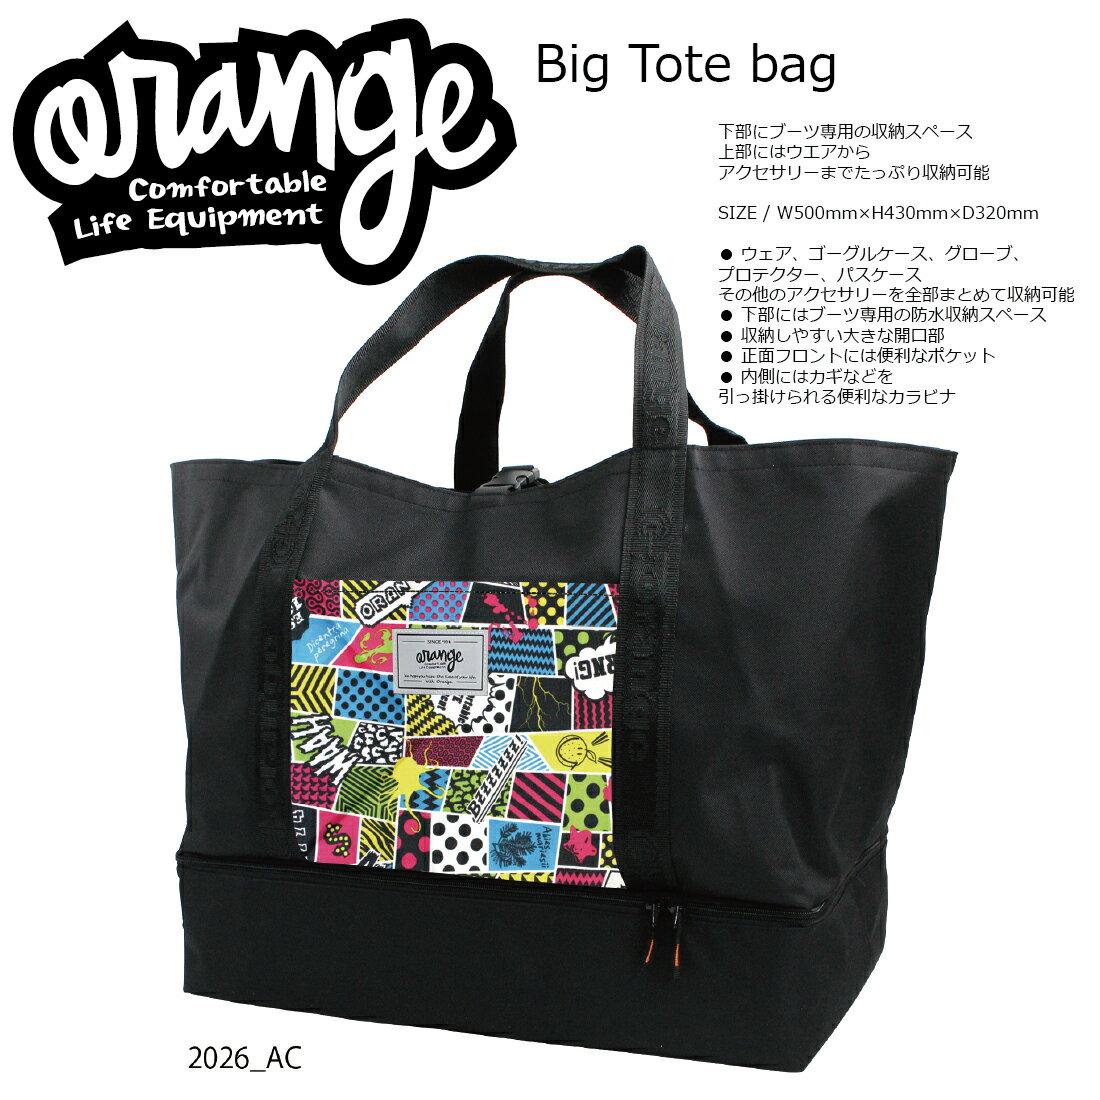 Oran'ge Big Toto Bag 2026 AC オレンジ ビックトートバック ブーツ ウエア アクセサリー